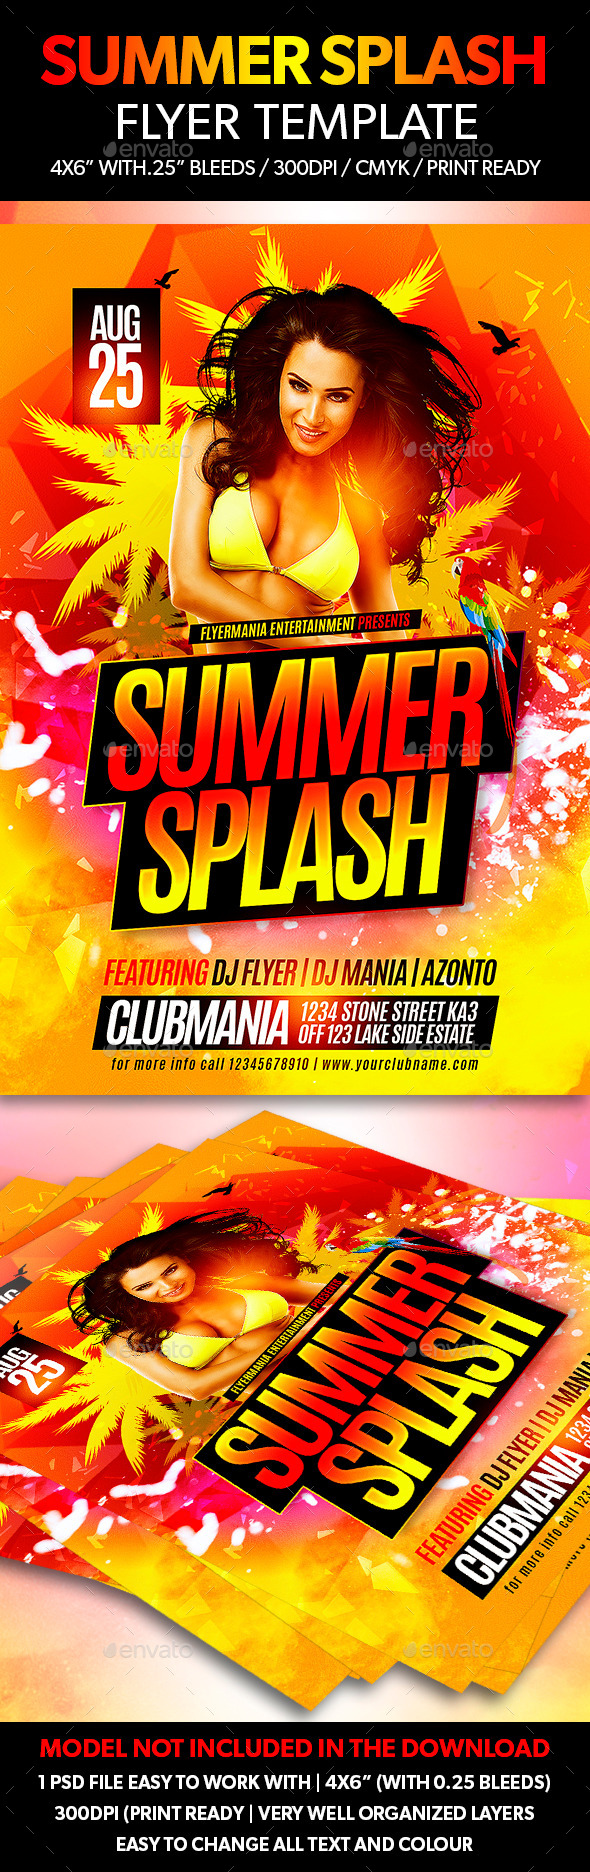 Summer Splash Flyer Template - Clubs & Parties Events